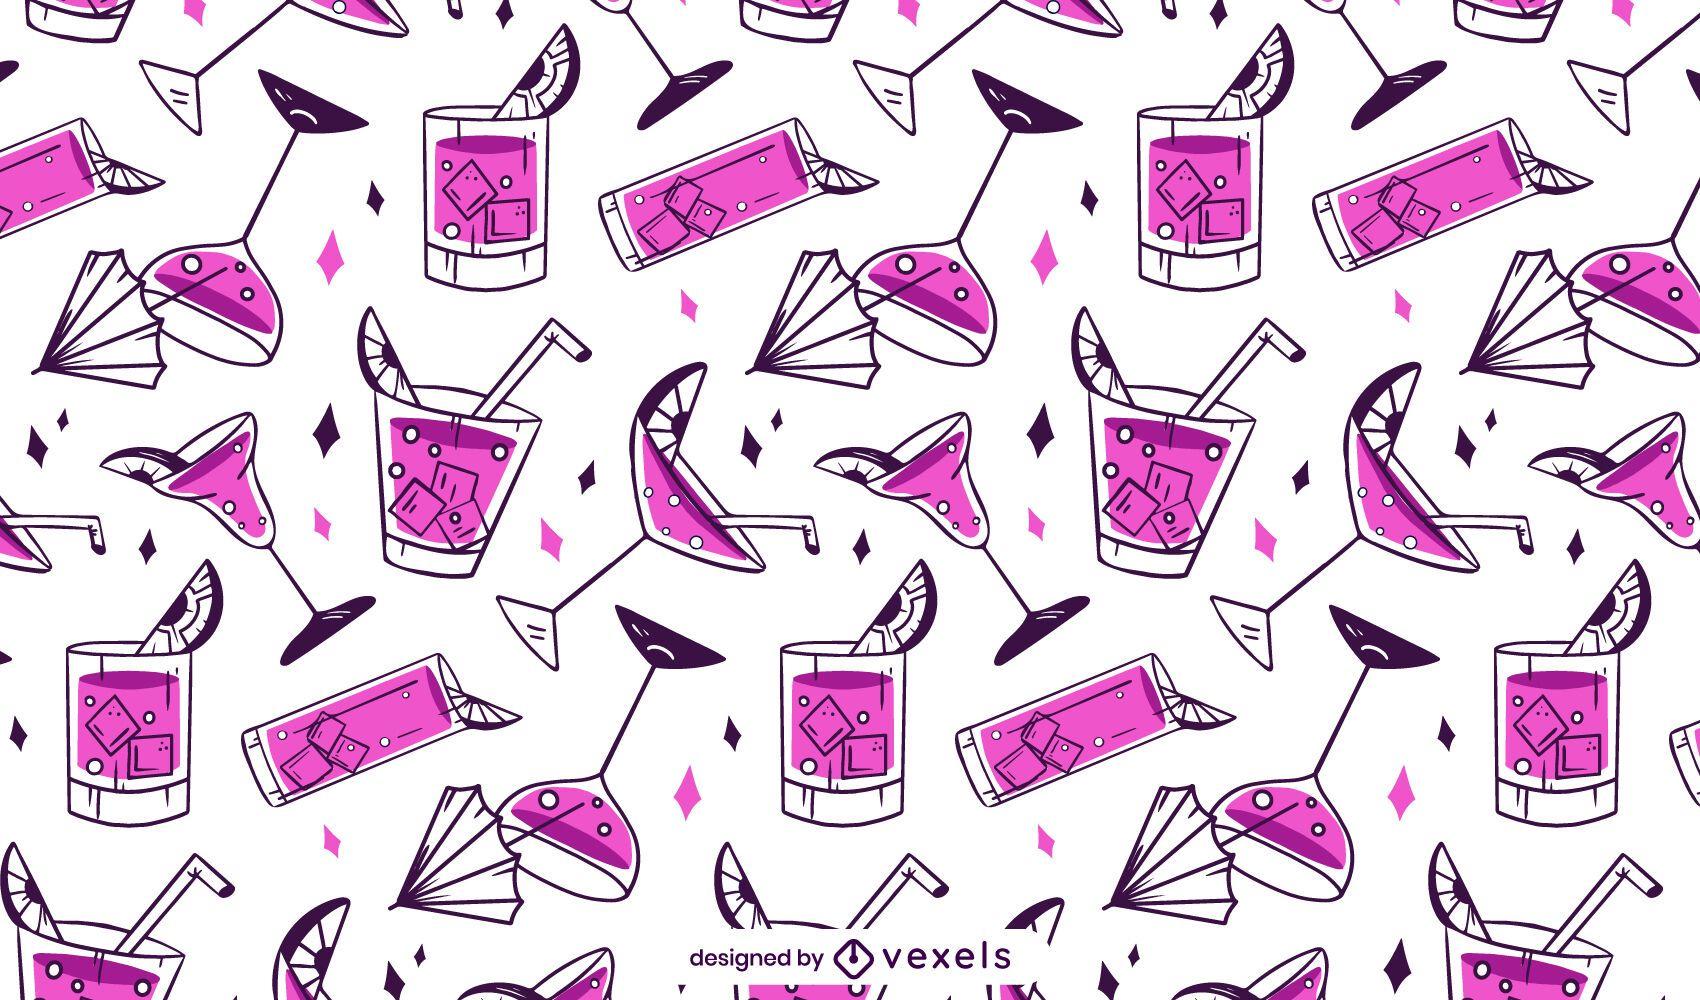 Diseño de patrón de cócteles rosa